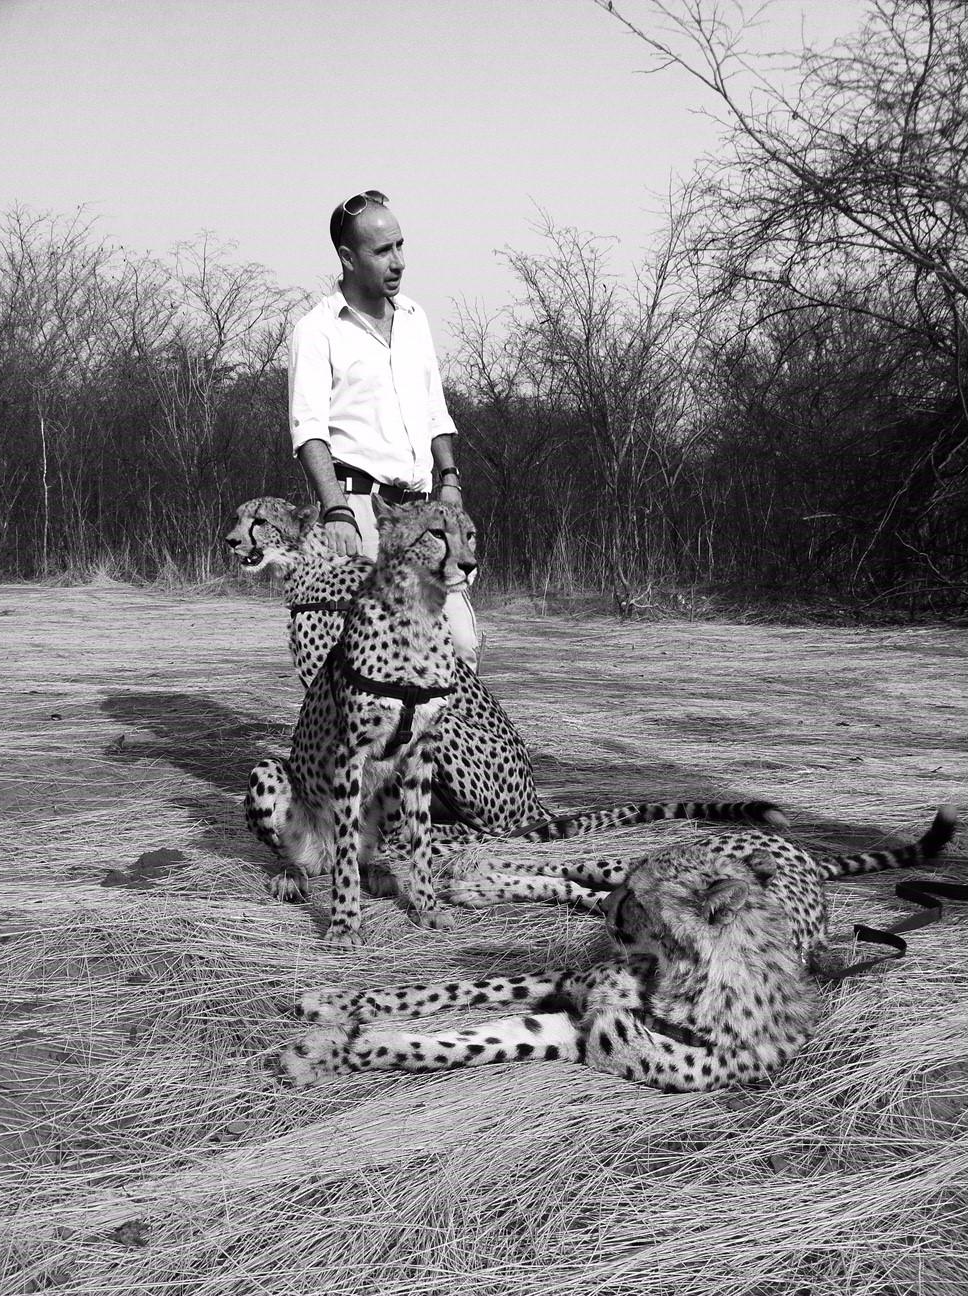 Sanctuary Lion Reserve, Zambia